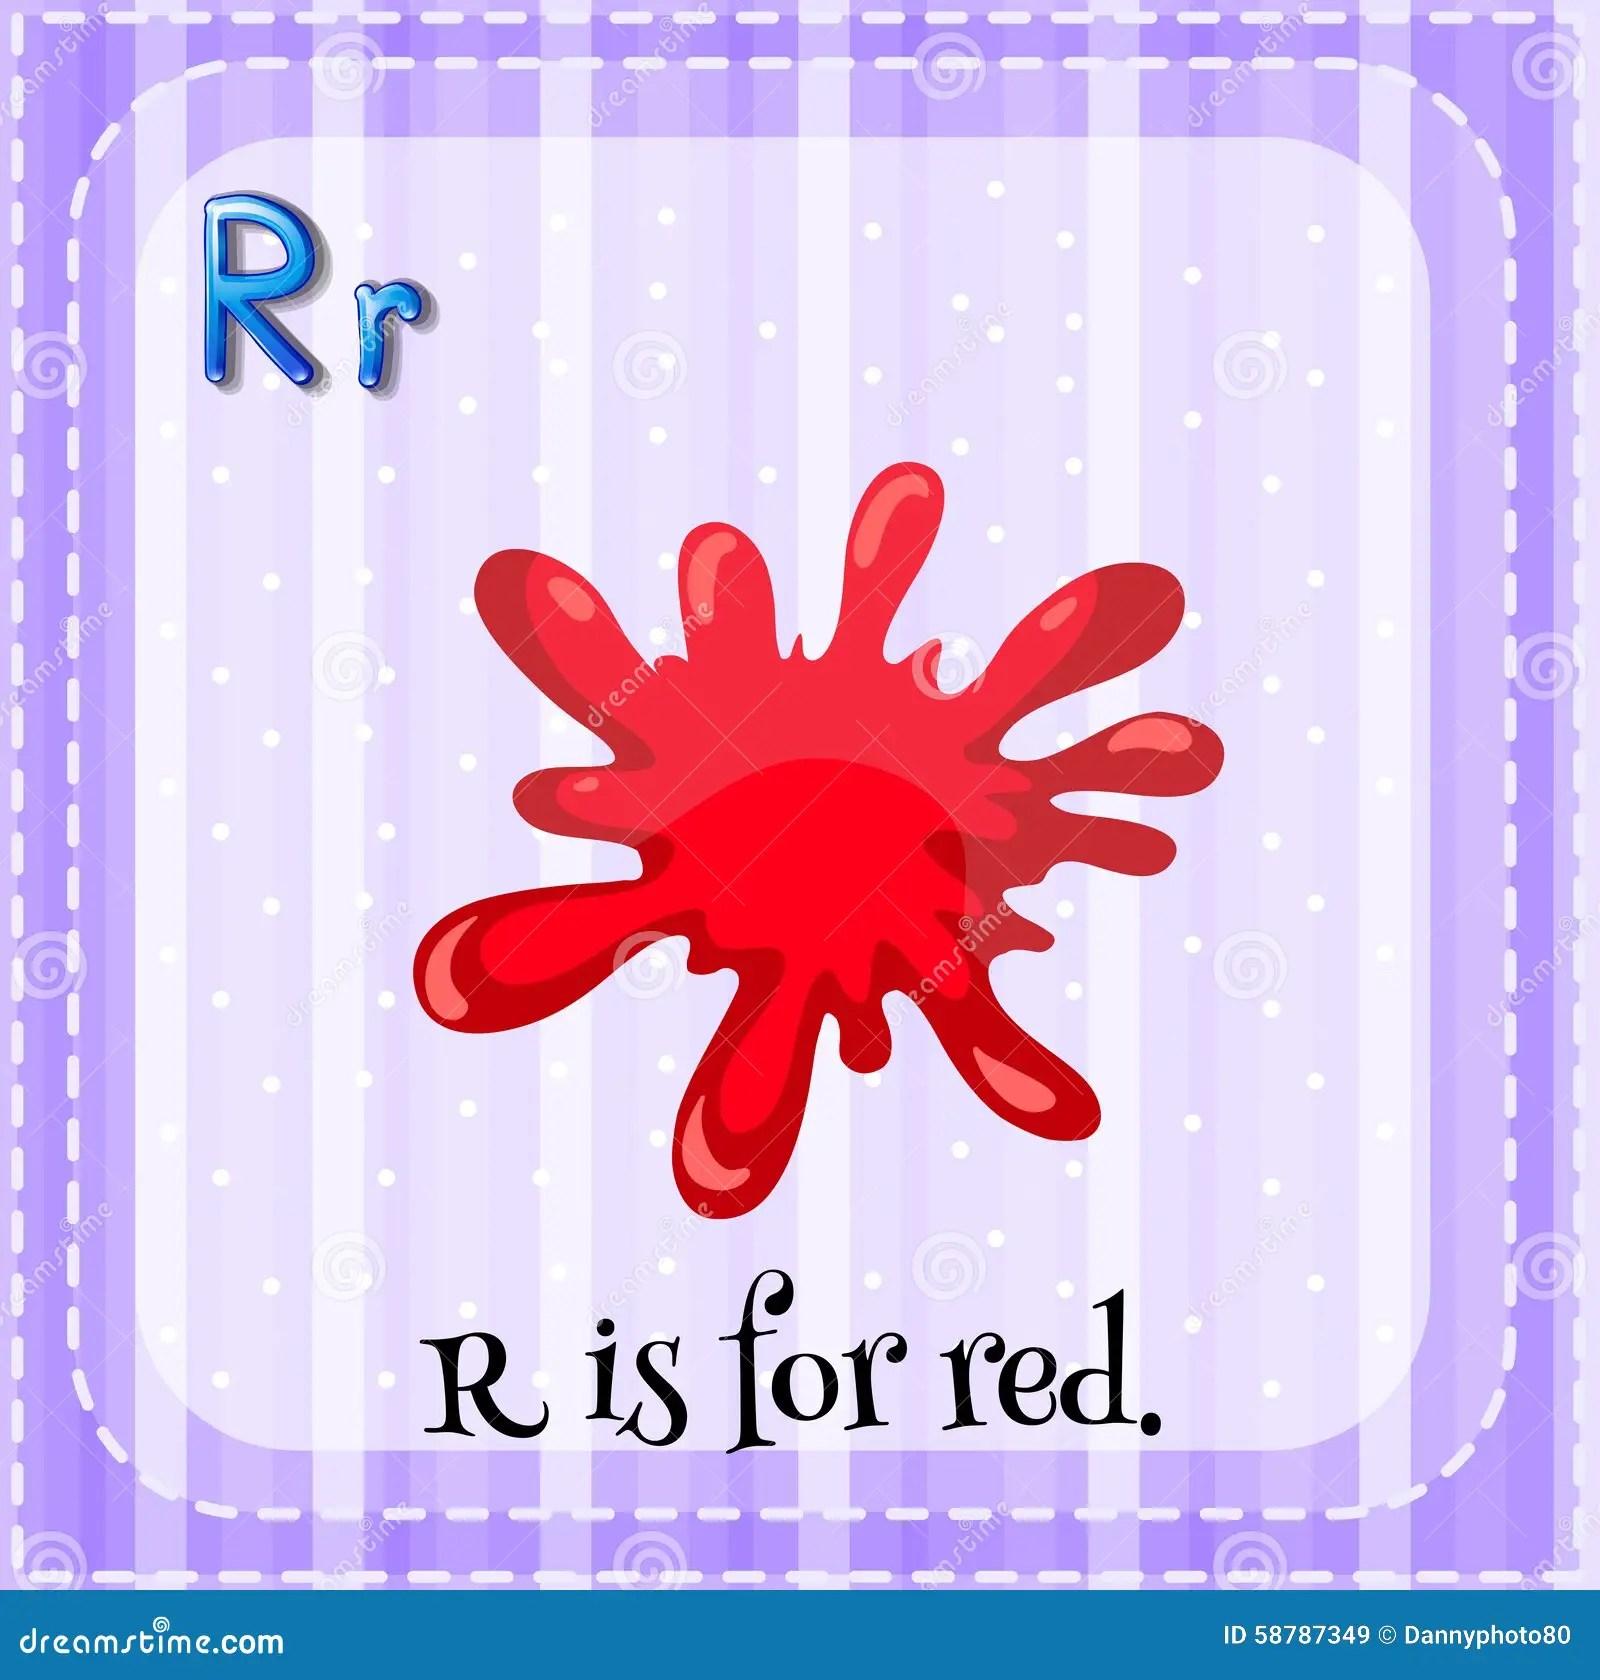 Flashcard Of Letter R Stock Vector Illustration Of Letter